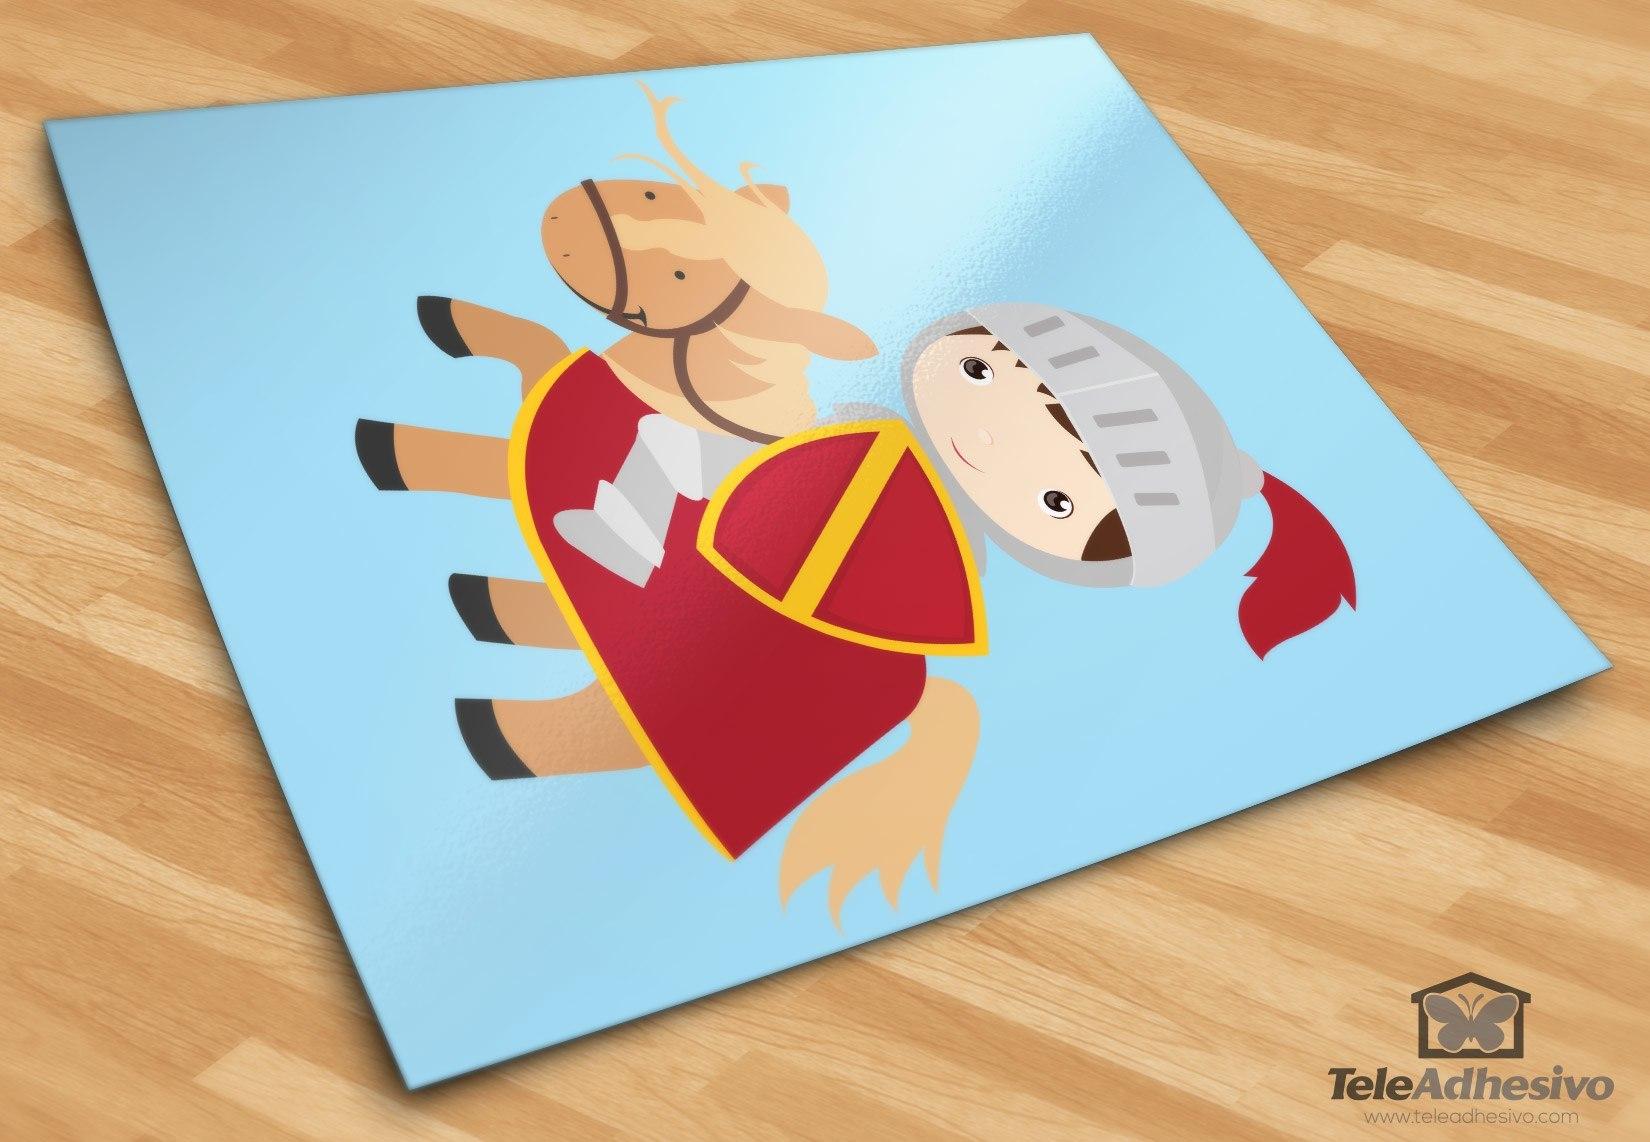 Kinderzimmer Wandtattoo: Rote Ritter